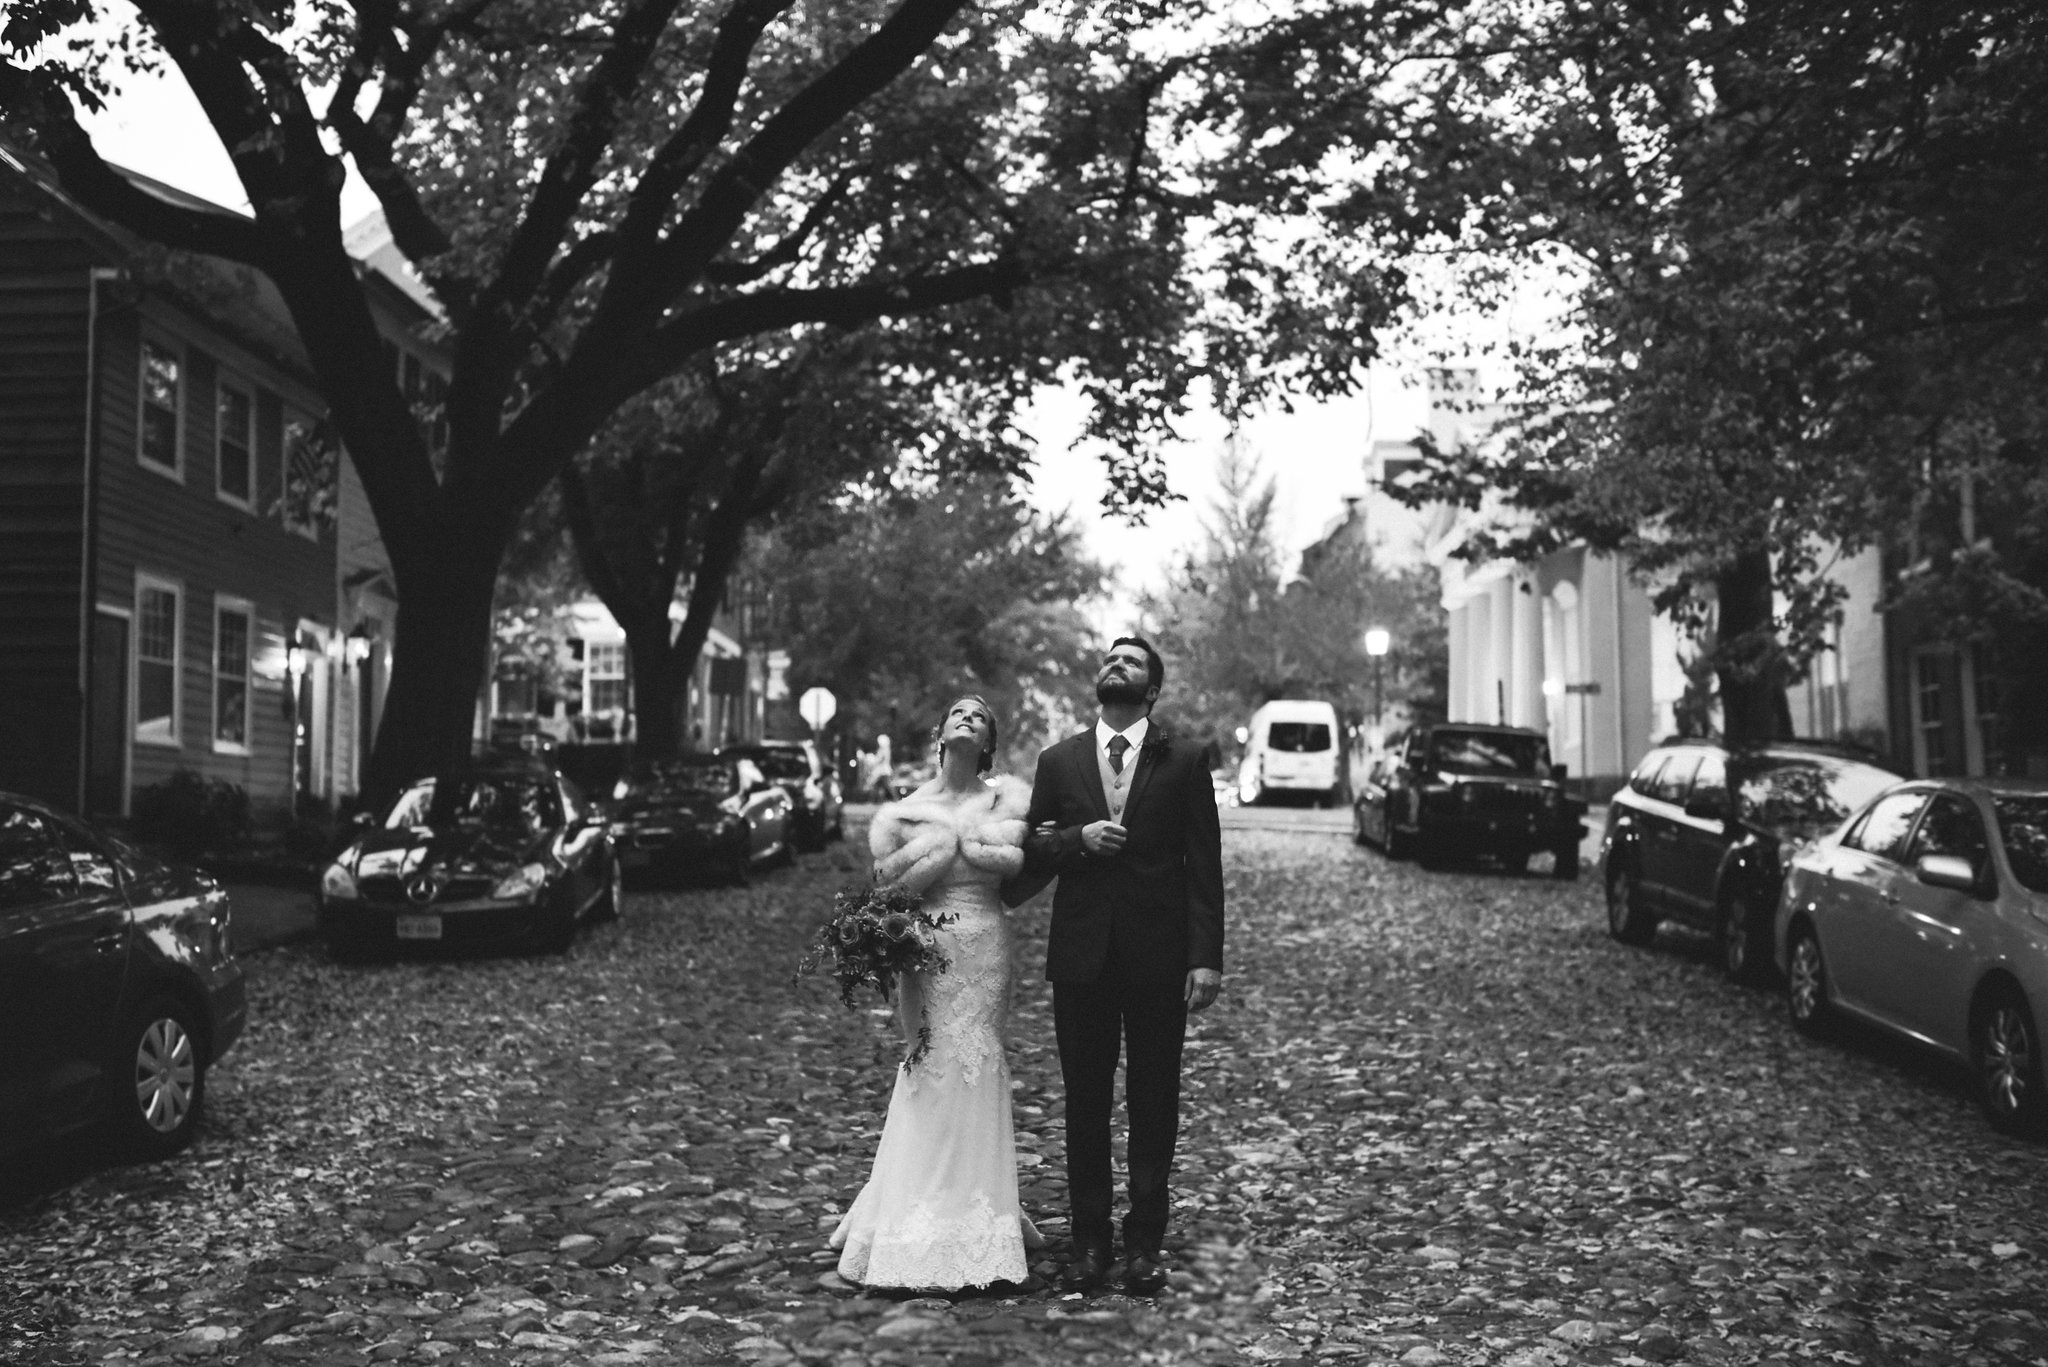 Alexandria, DC, Jos A. Bank Suit, Lian Carlo Wedding Dress, Bride and Groom, Old Town, Black and White Photo, Evening Wedding, City Wedding, Baltimore Wedding Photographer